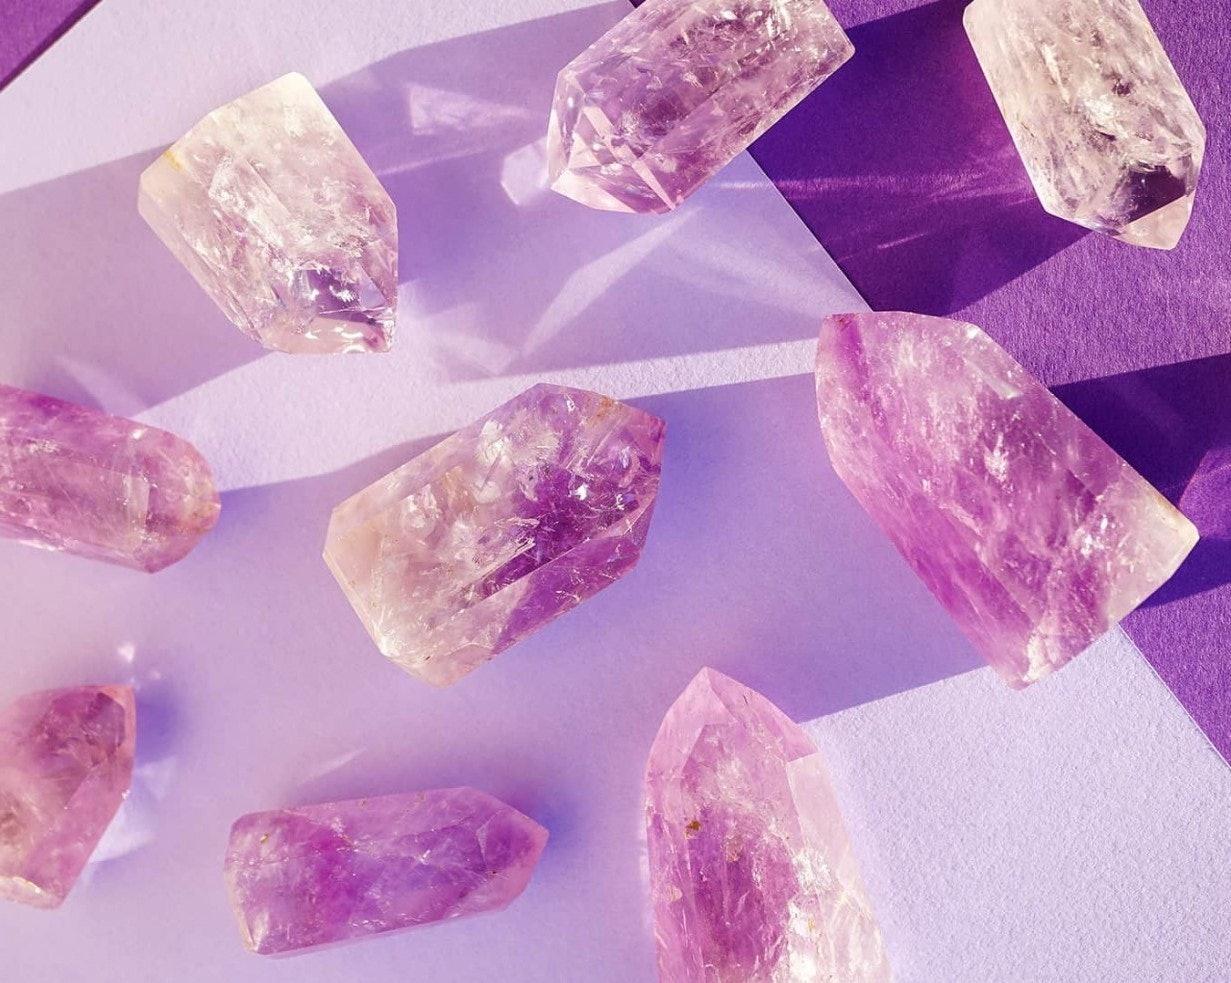 Natural Healing Gemstones Rose Quartz Crystals Heart Shaped Stone 4 Styles DIY